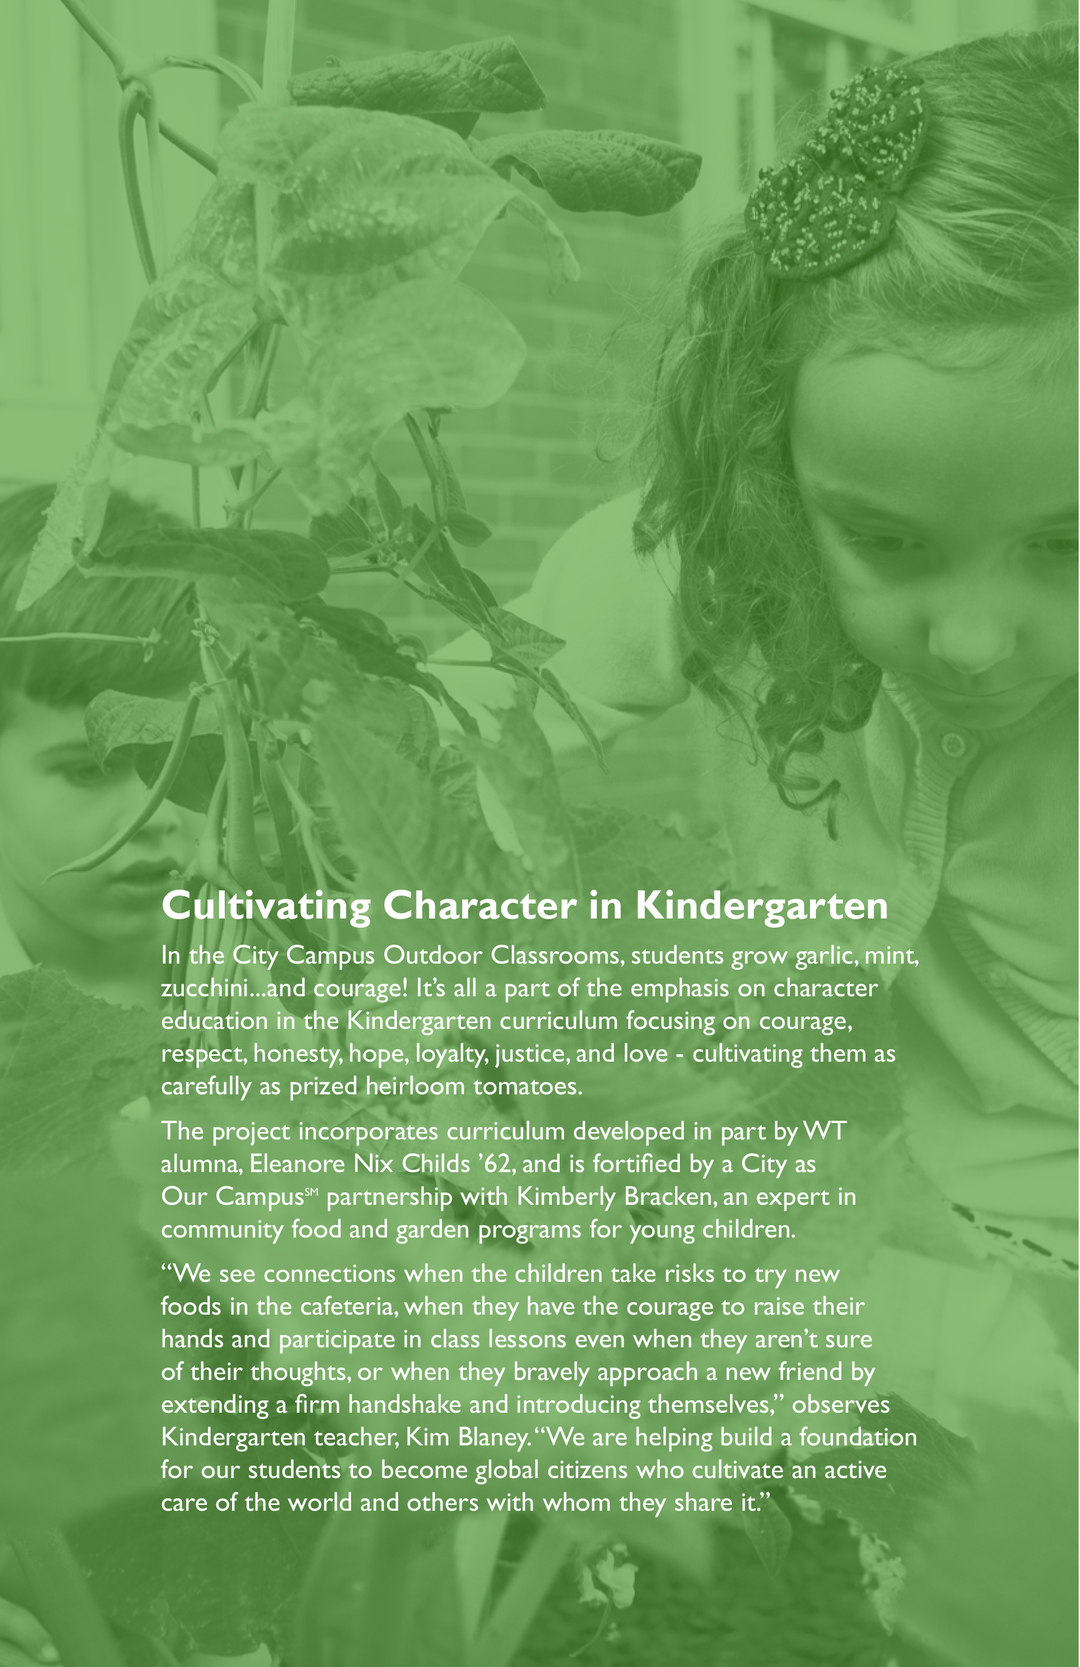 Annual Giving Report - Winchester Thurston School